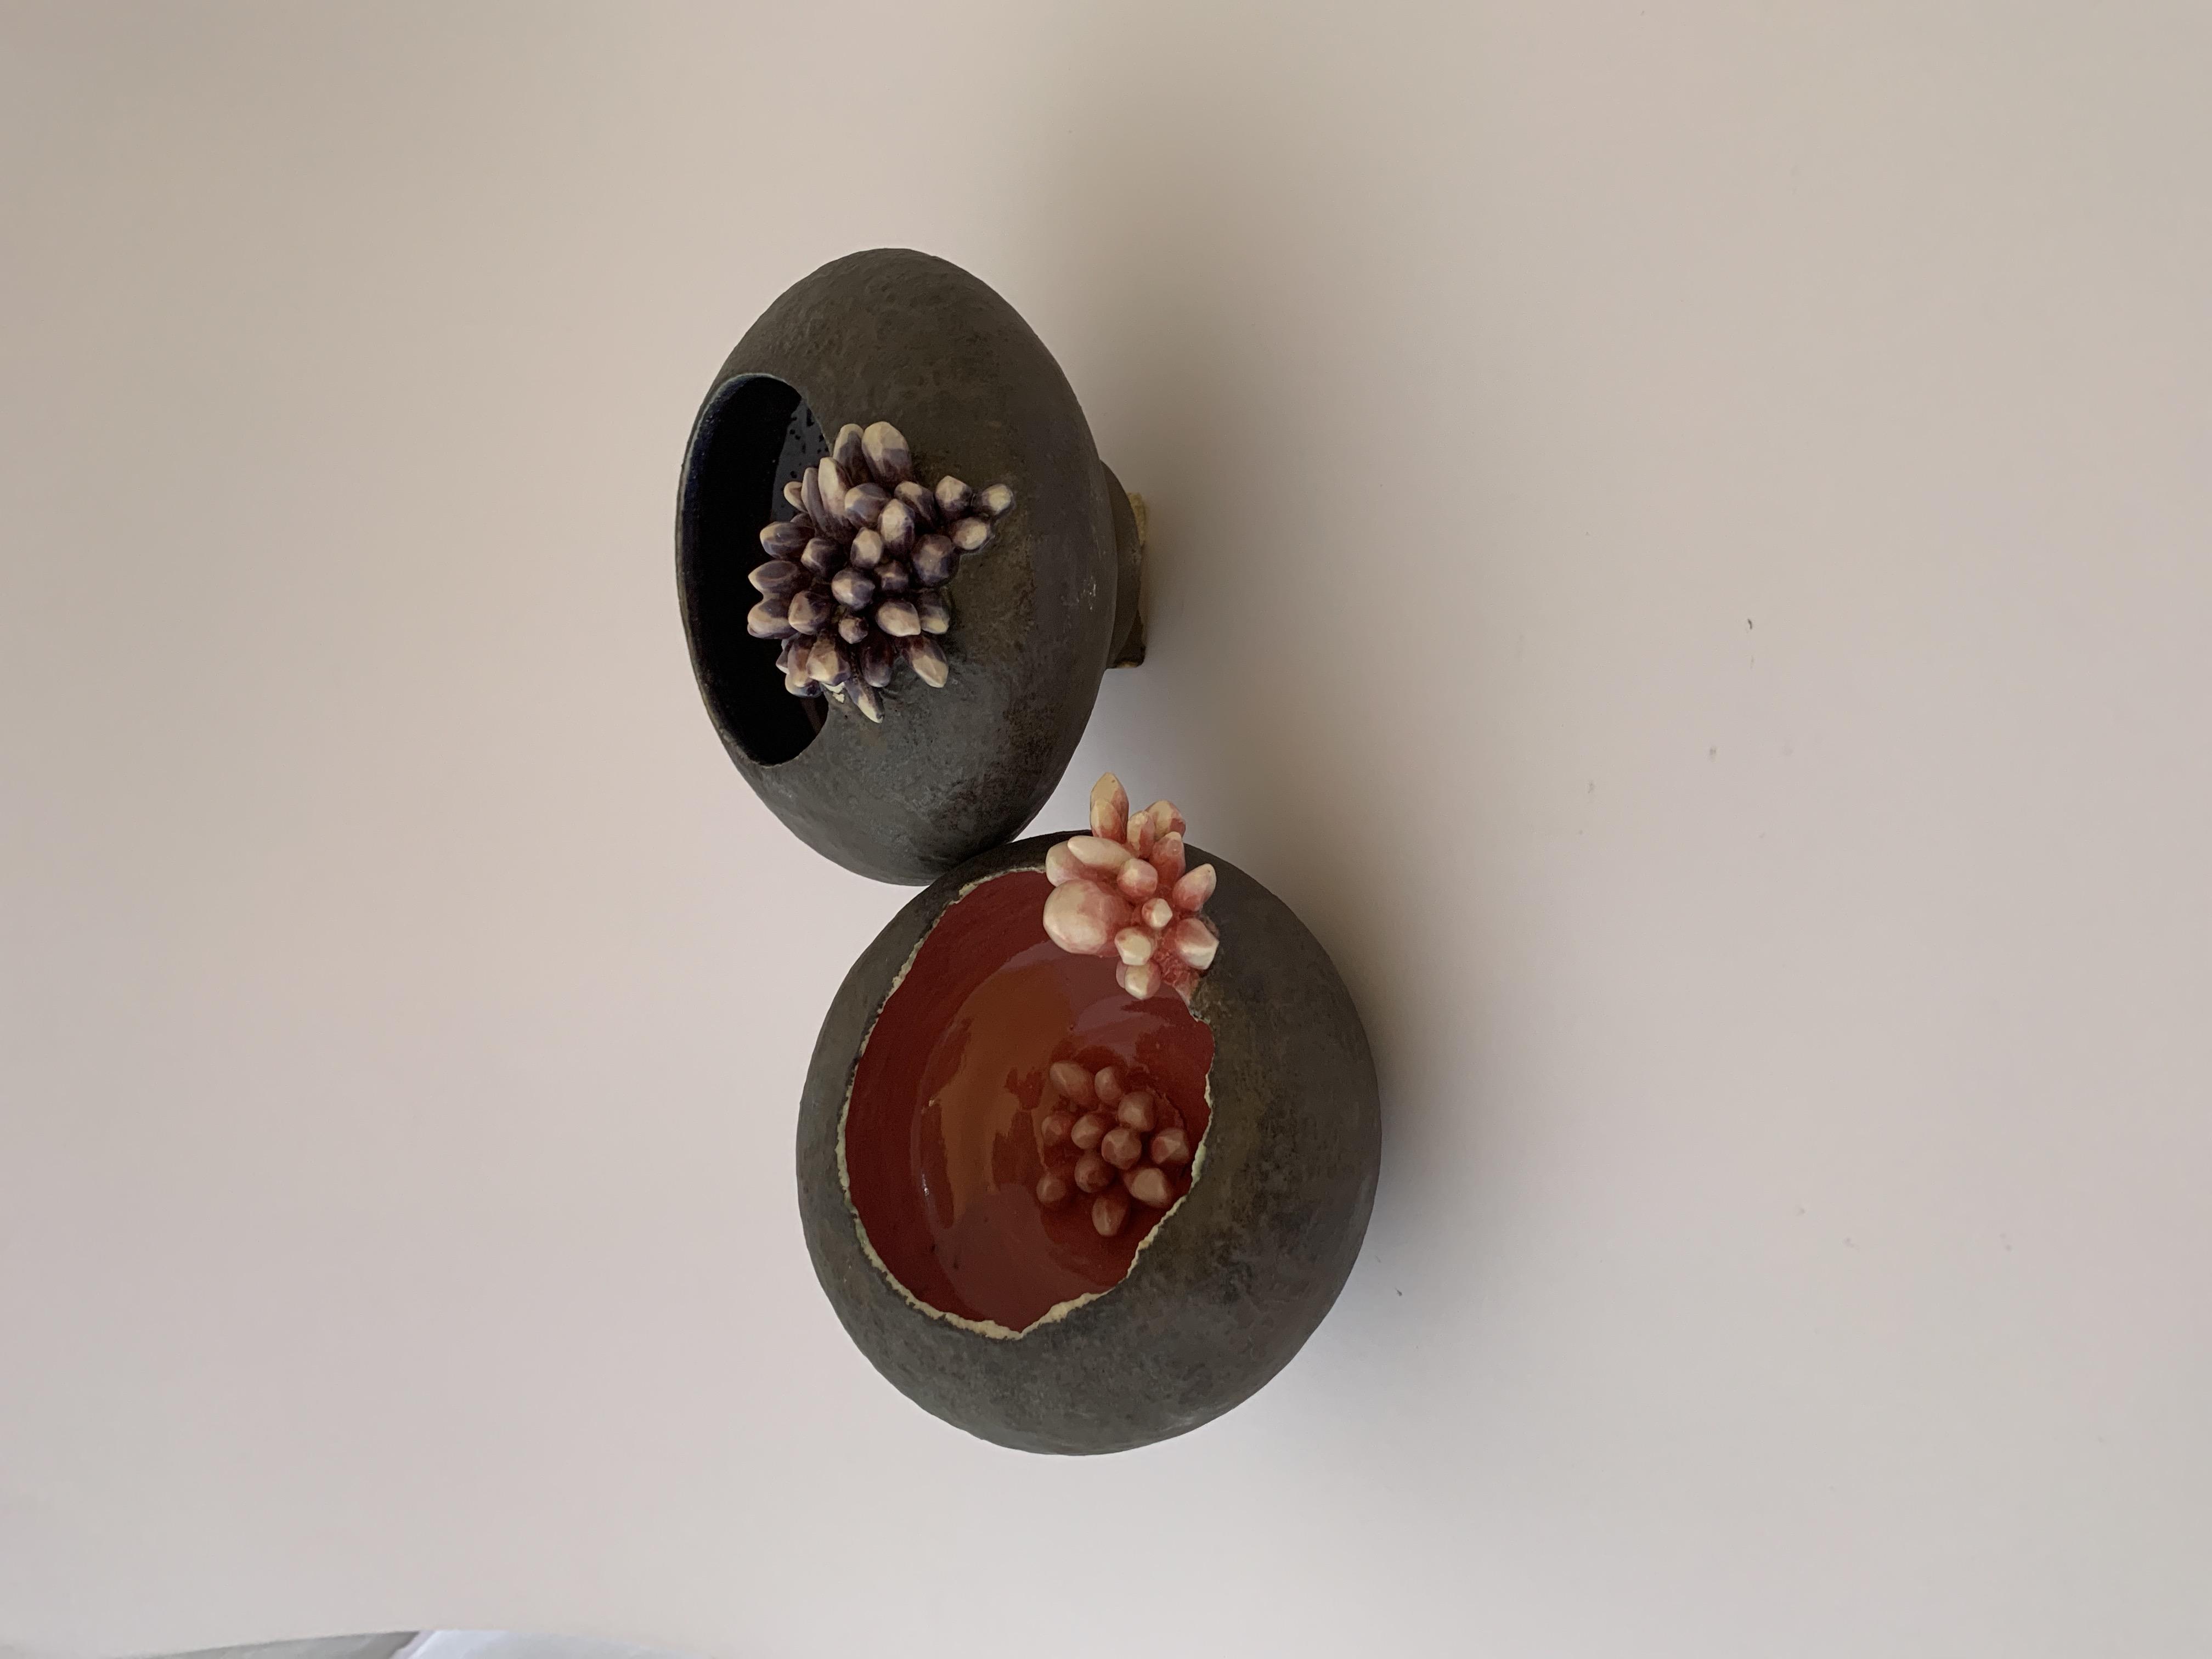 Geode bowls